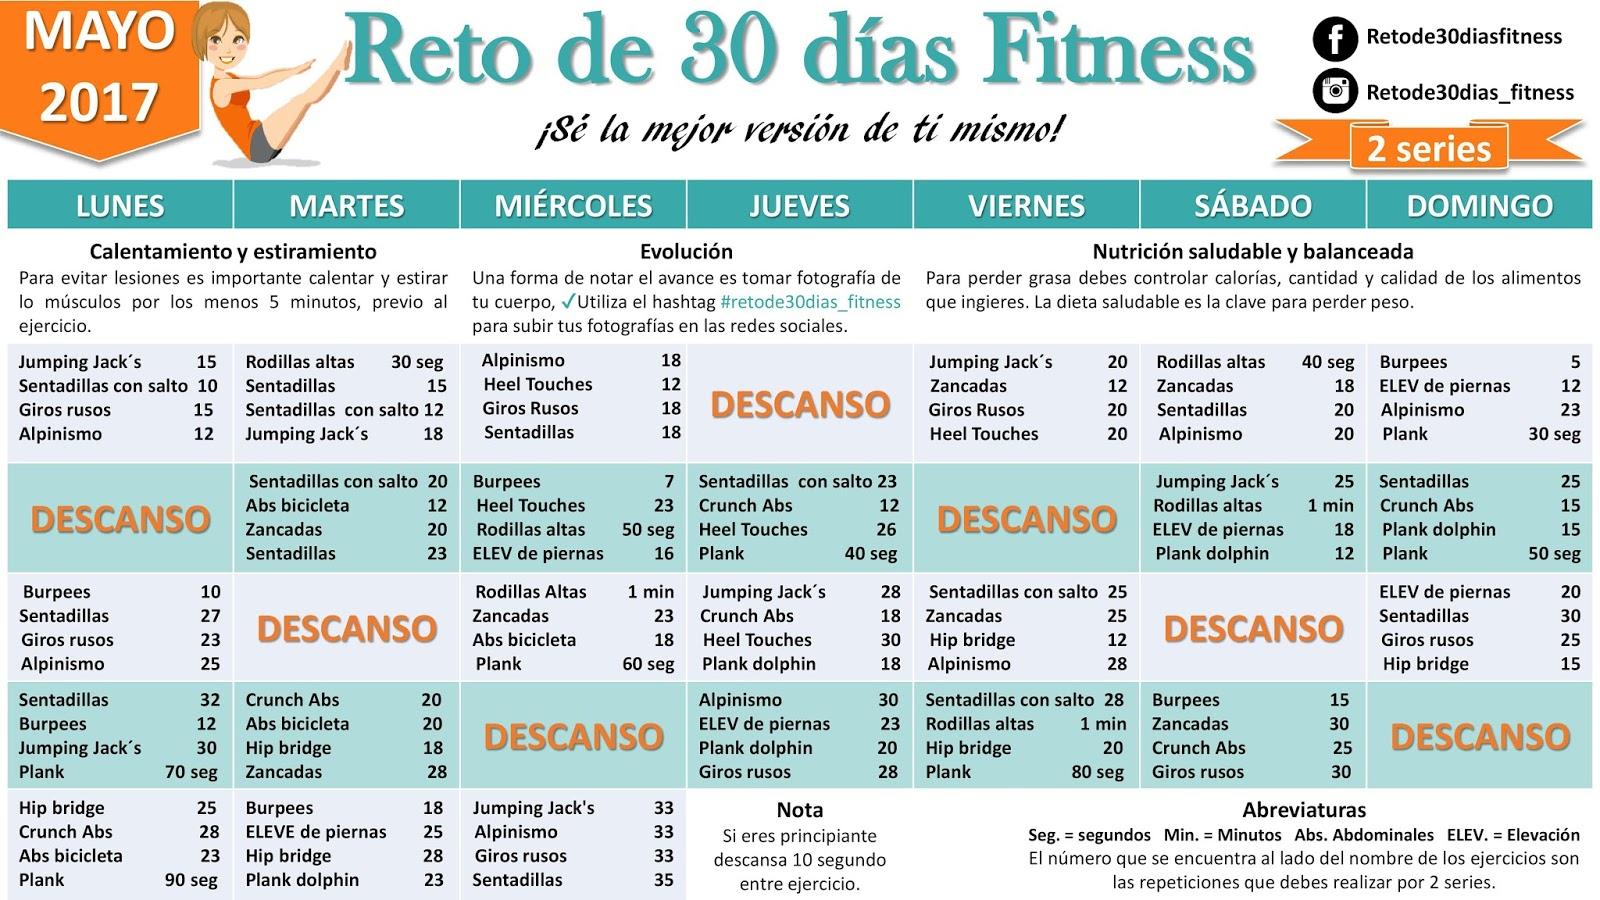 dieta para aumentar masa muscular rapidamente mujeres